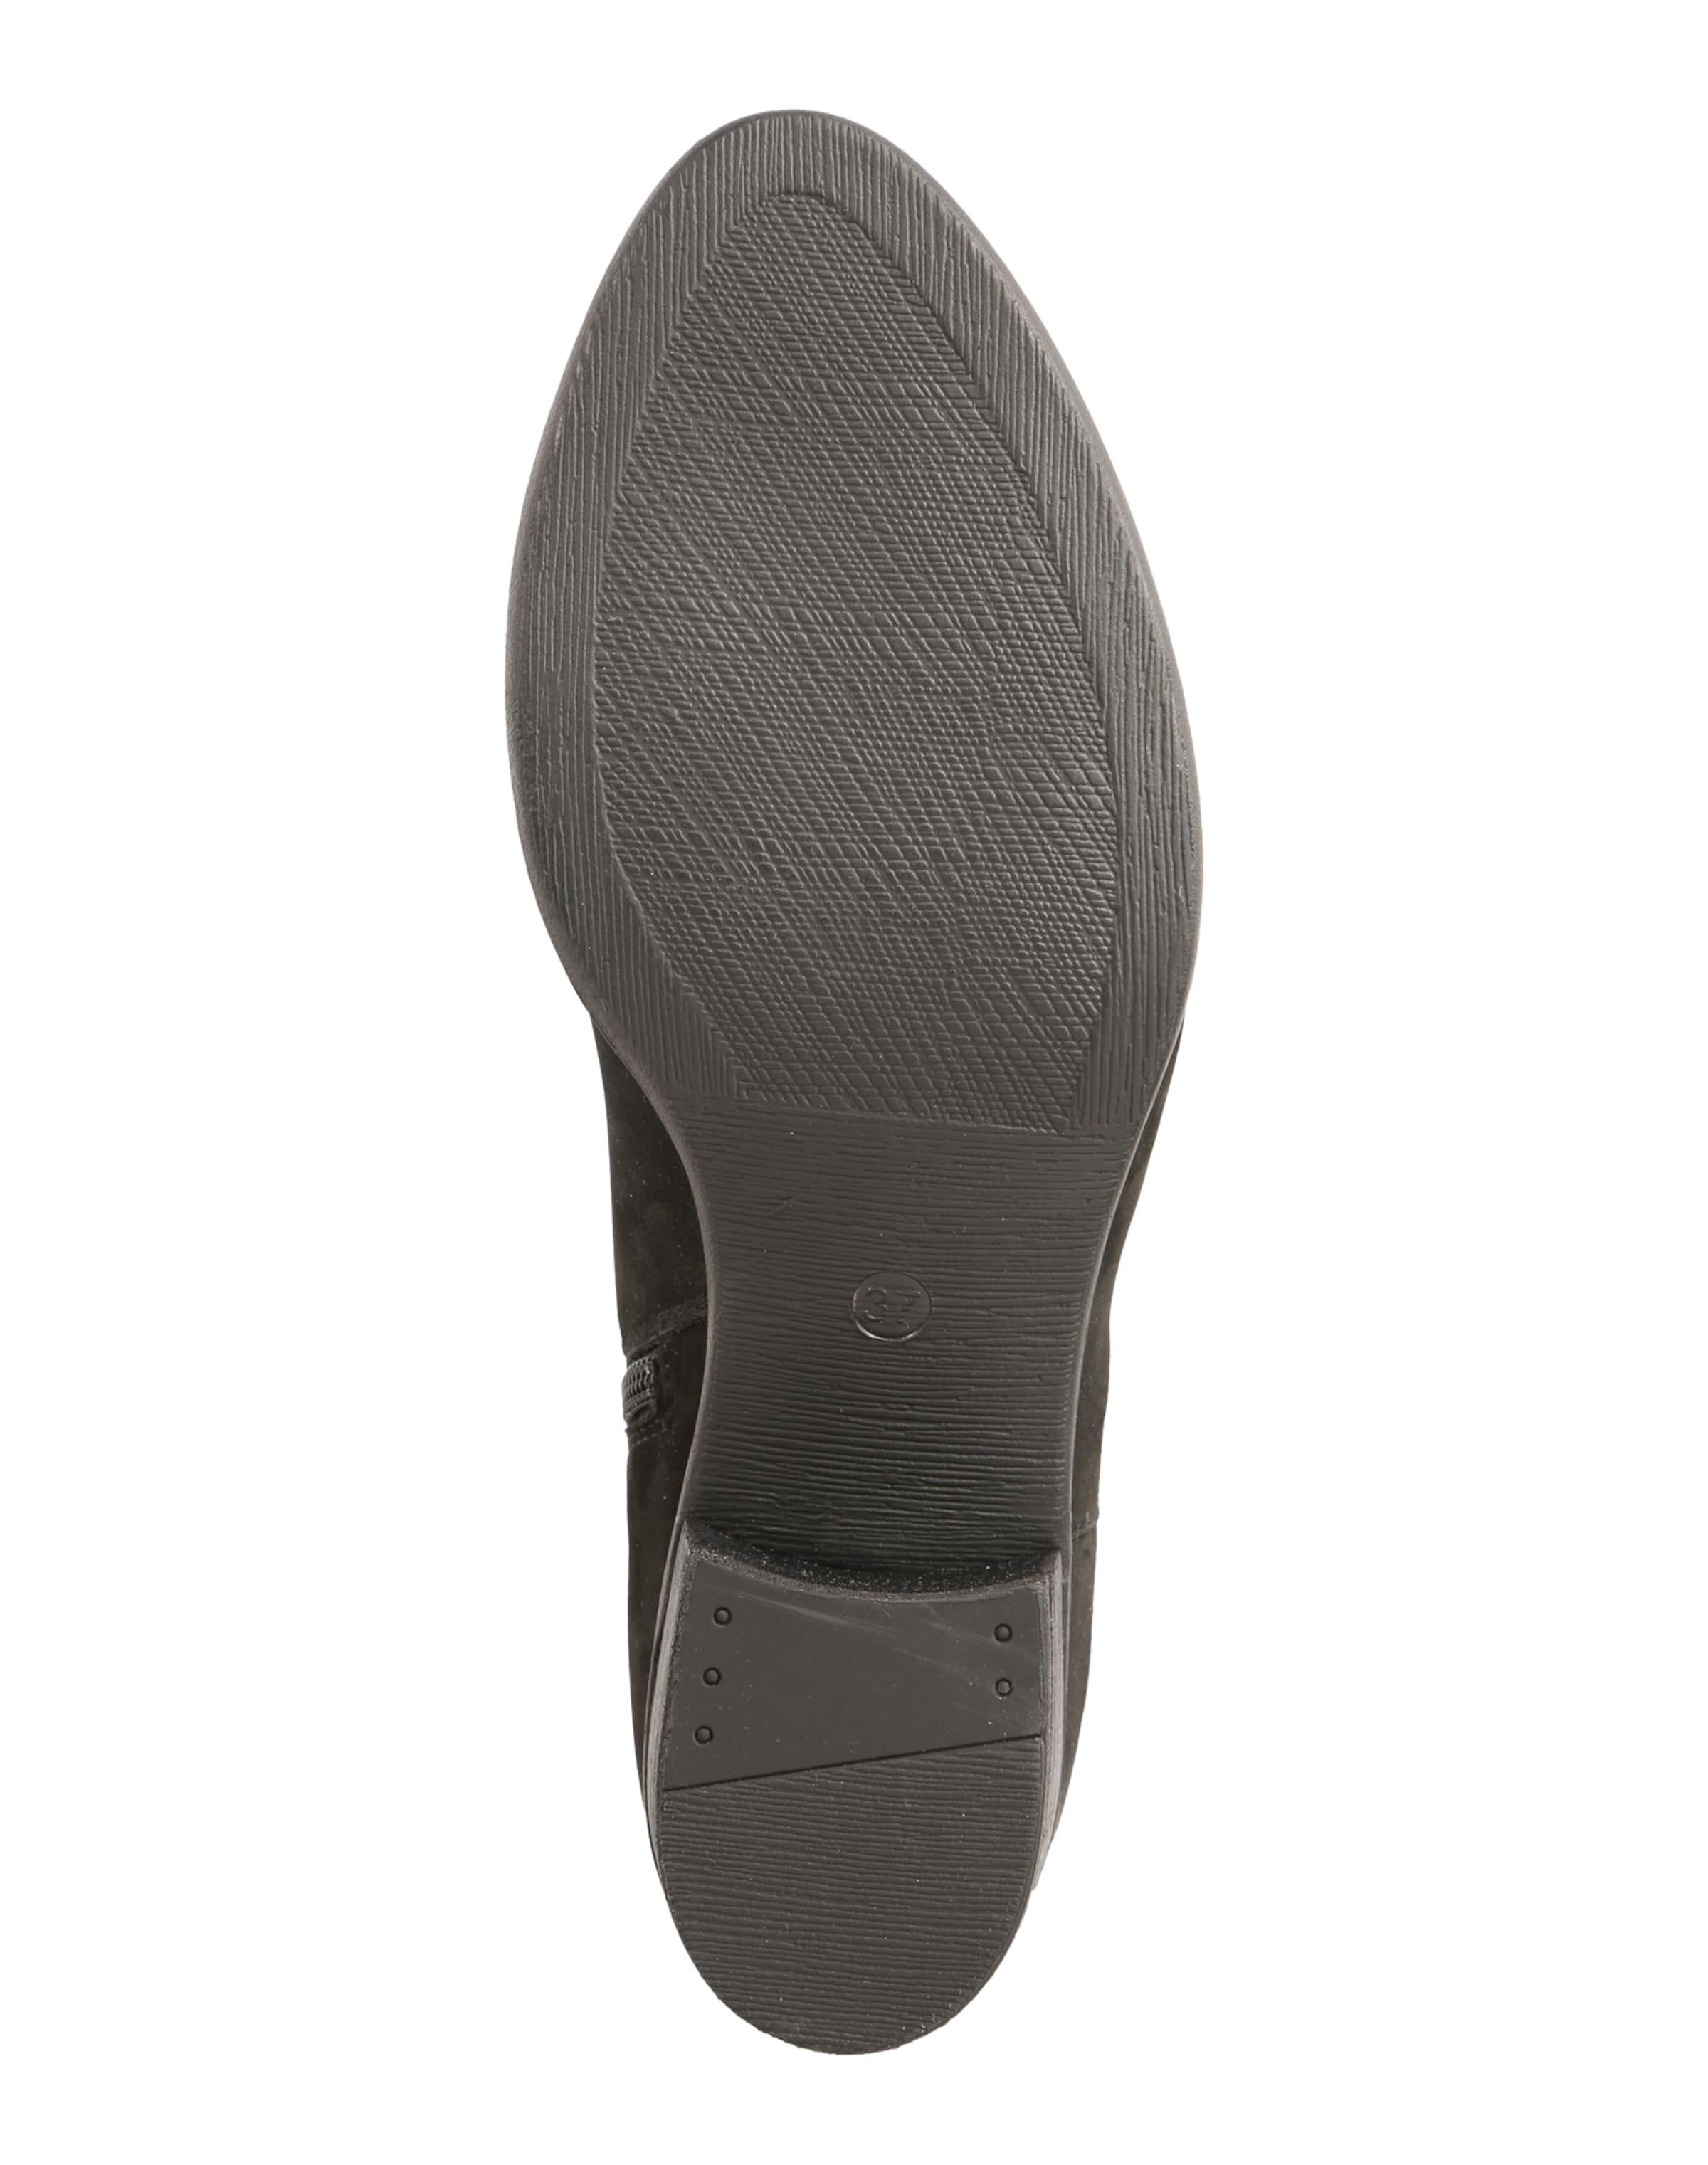 Anthrazit 'odette' In Spm Ankle Boots Aus Leder cjLR34qA5S